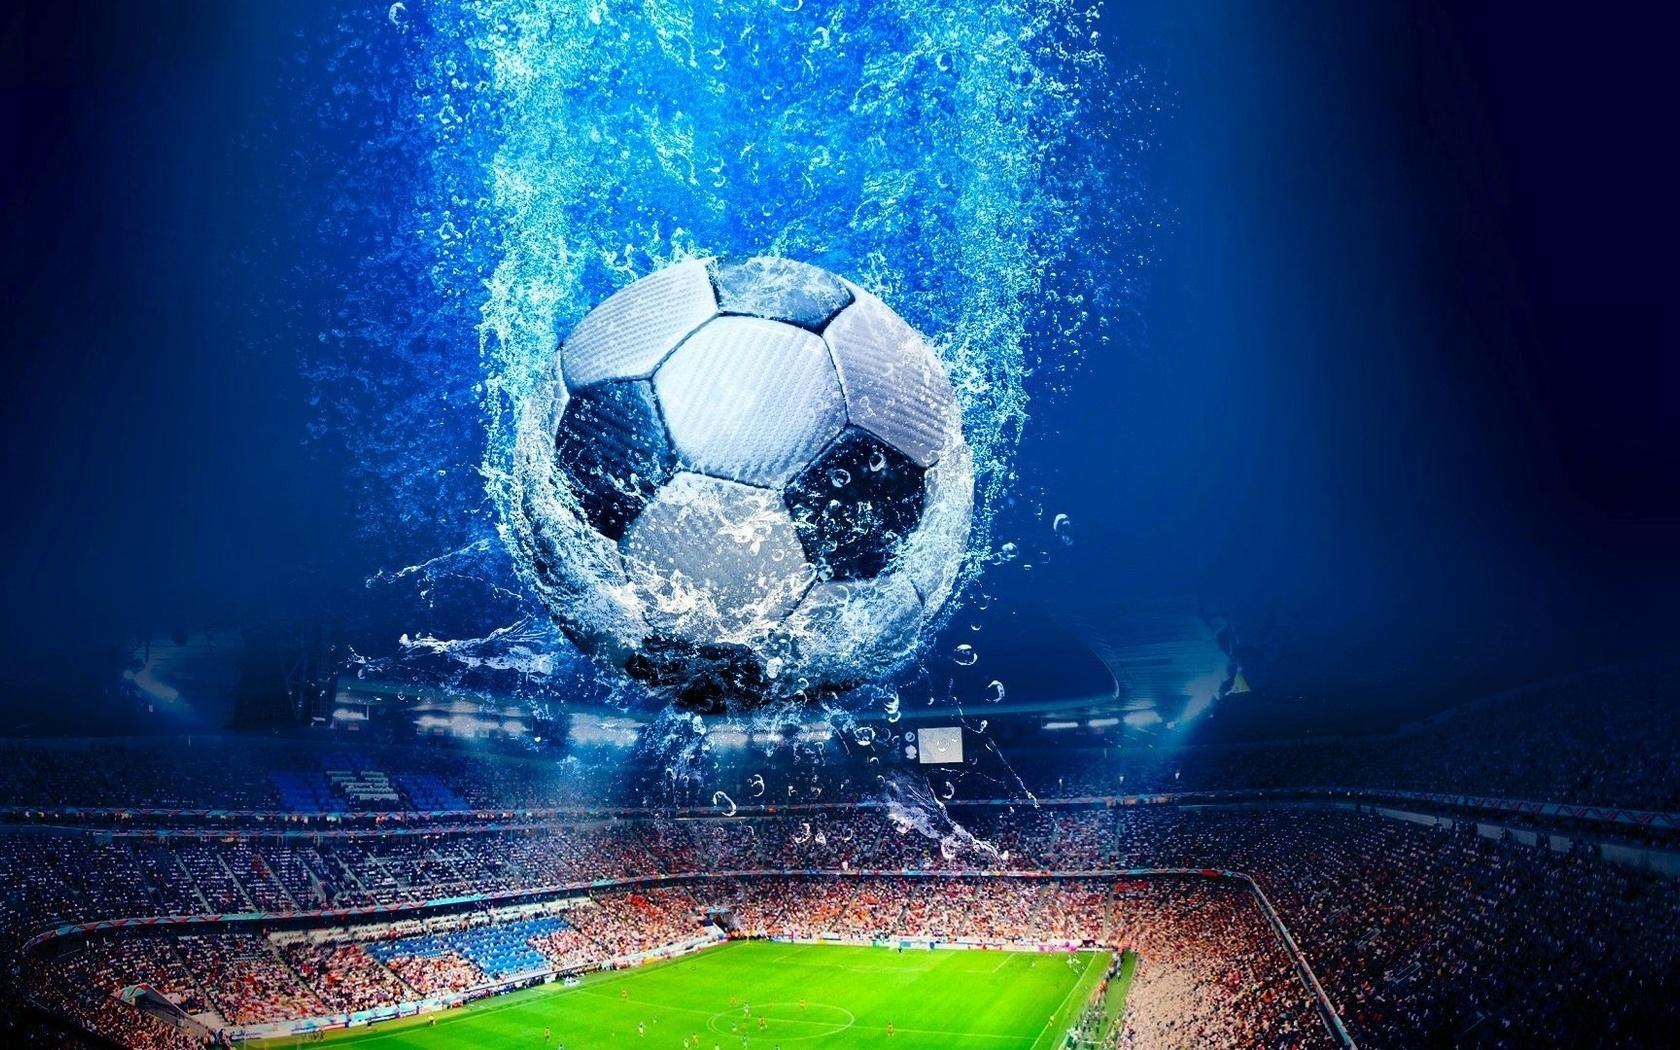 футбол, мяч, стадион